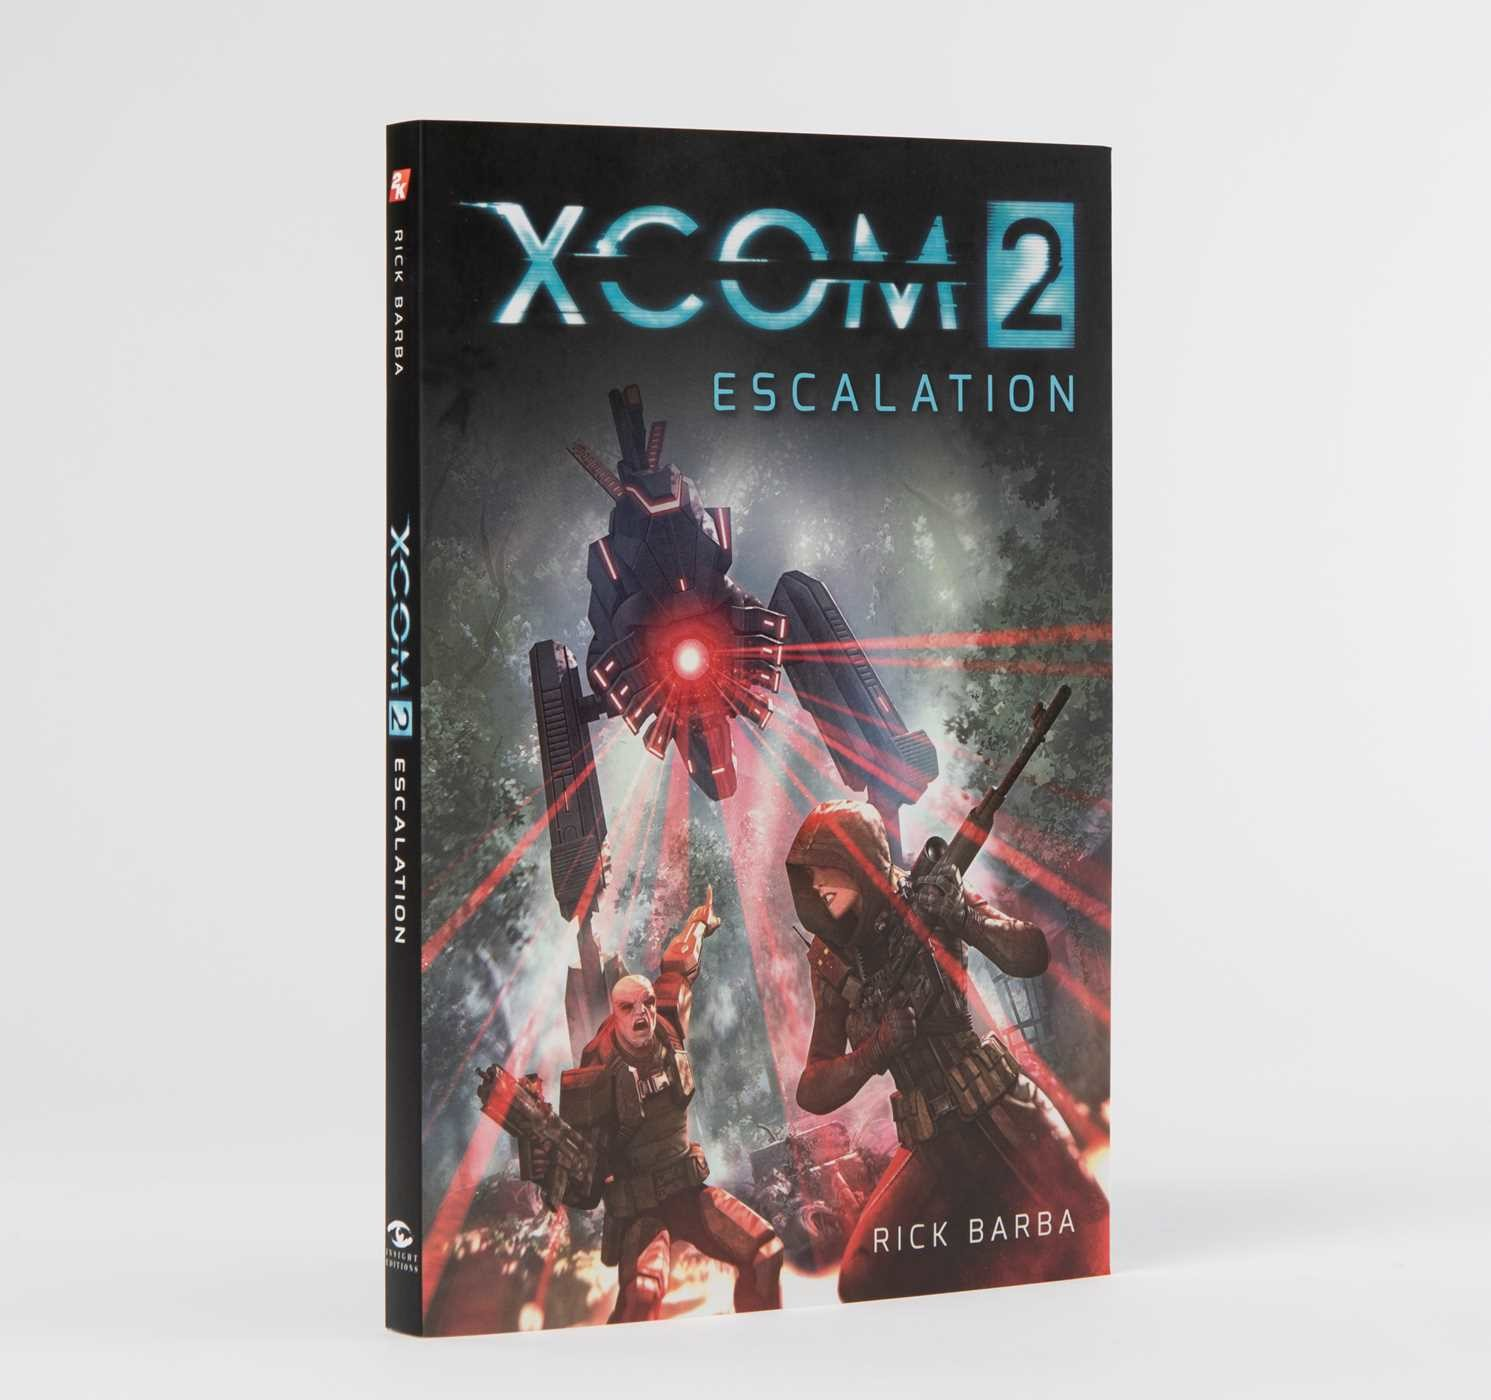 Xcom 2 escalation 9781608879922.in08